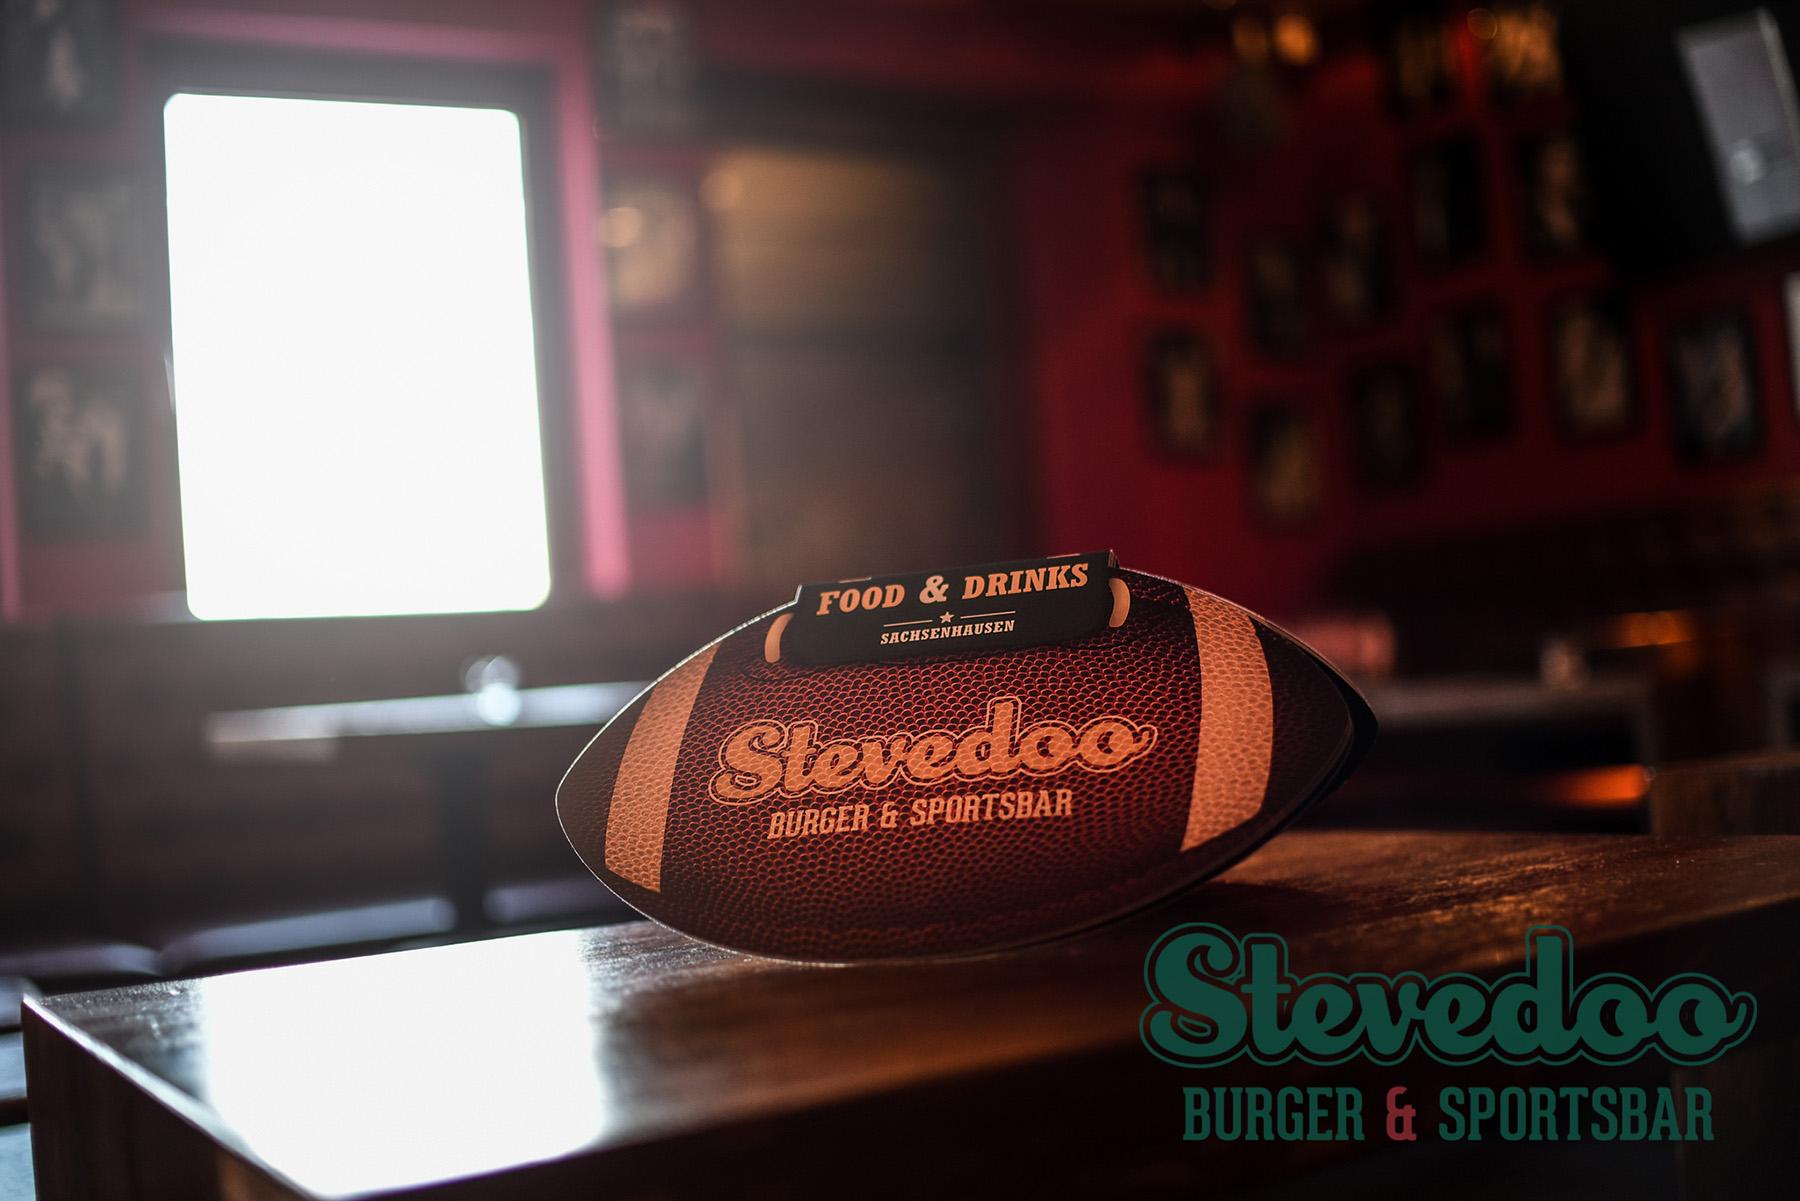 Stevedoo_Burger_Sportbar_Frankfurt_FastFood_43